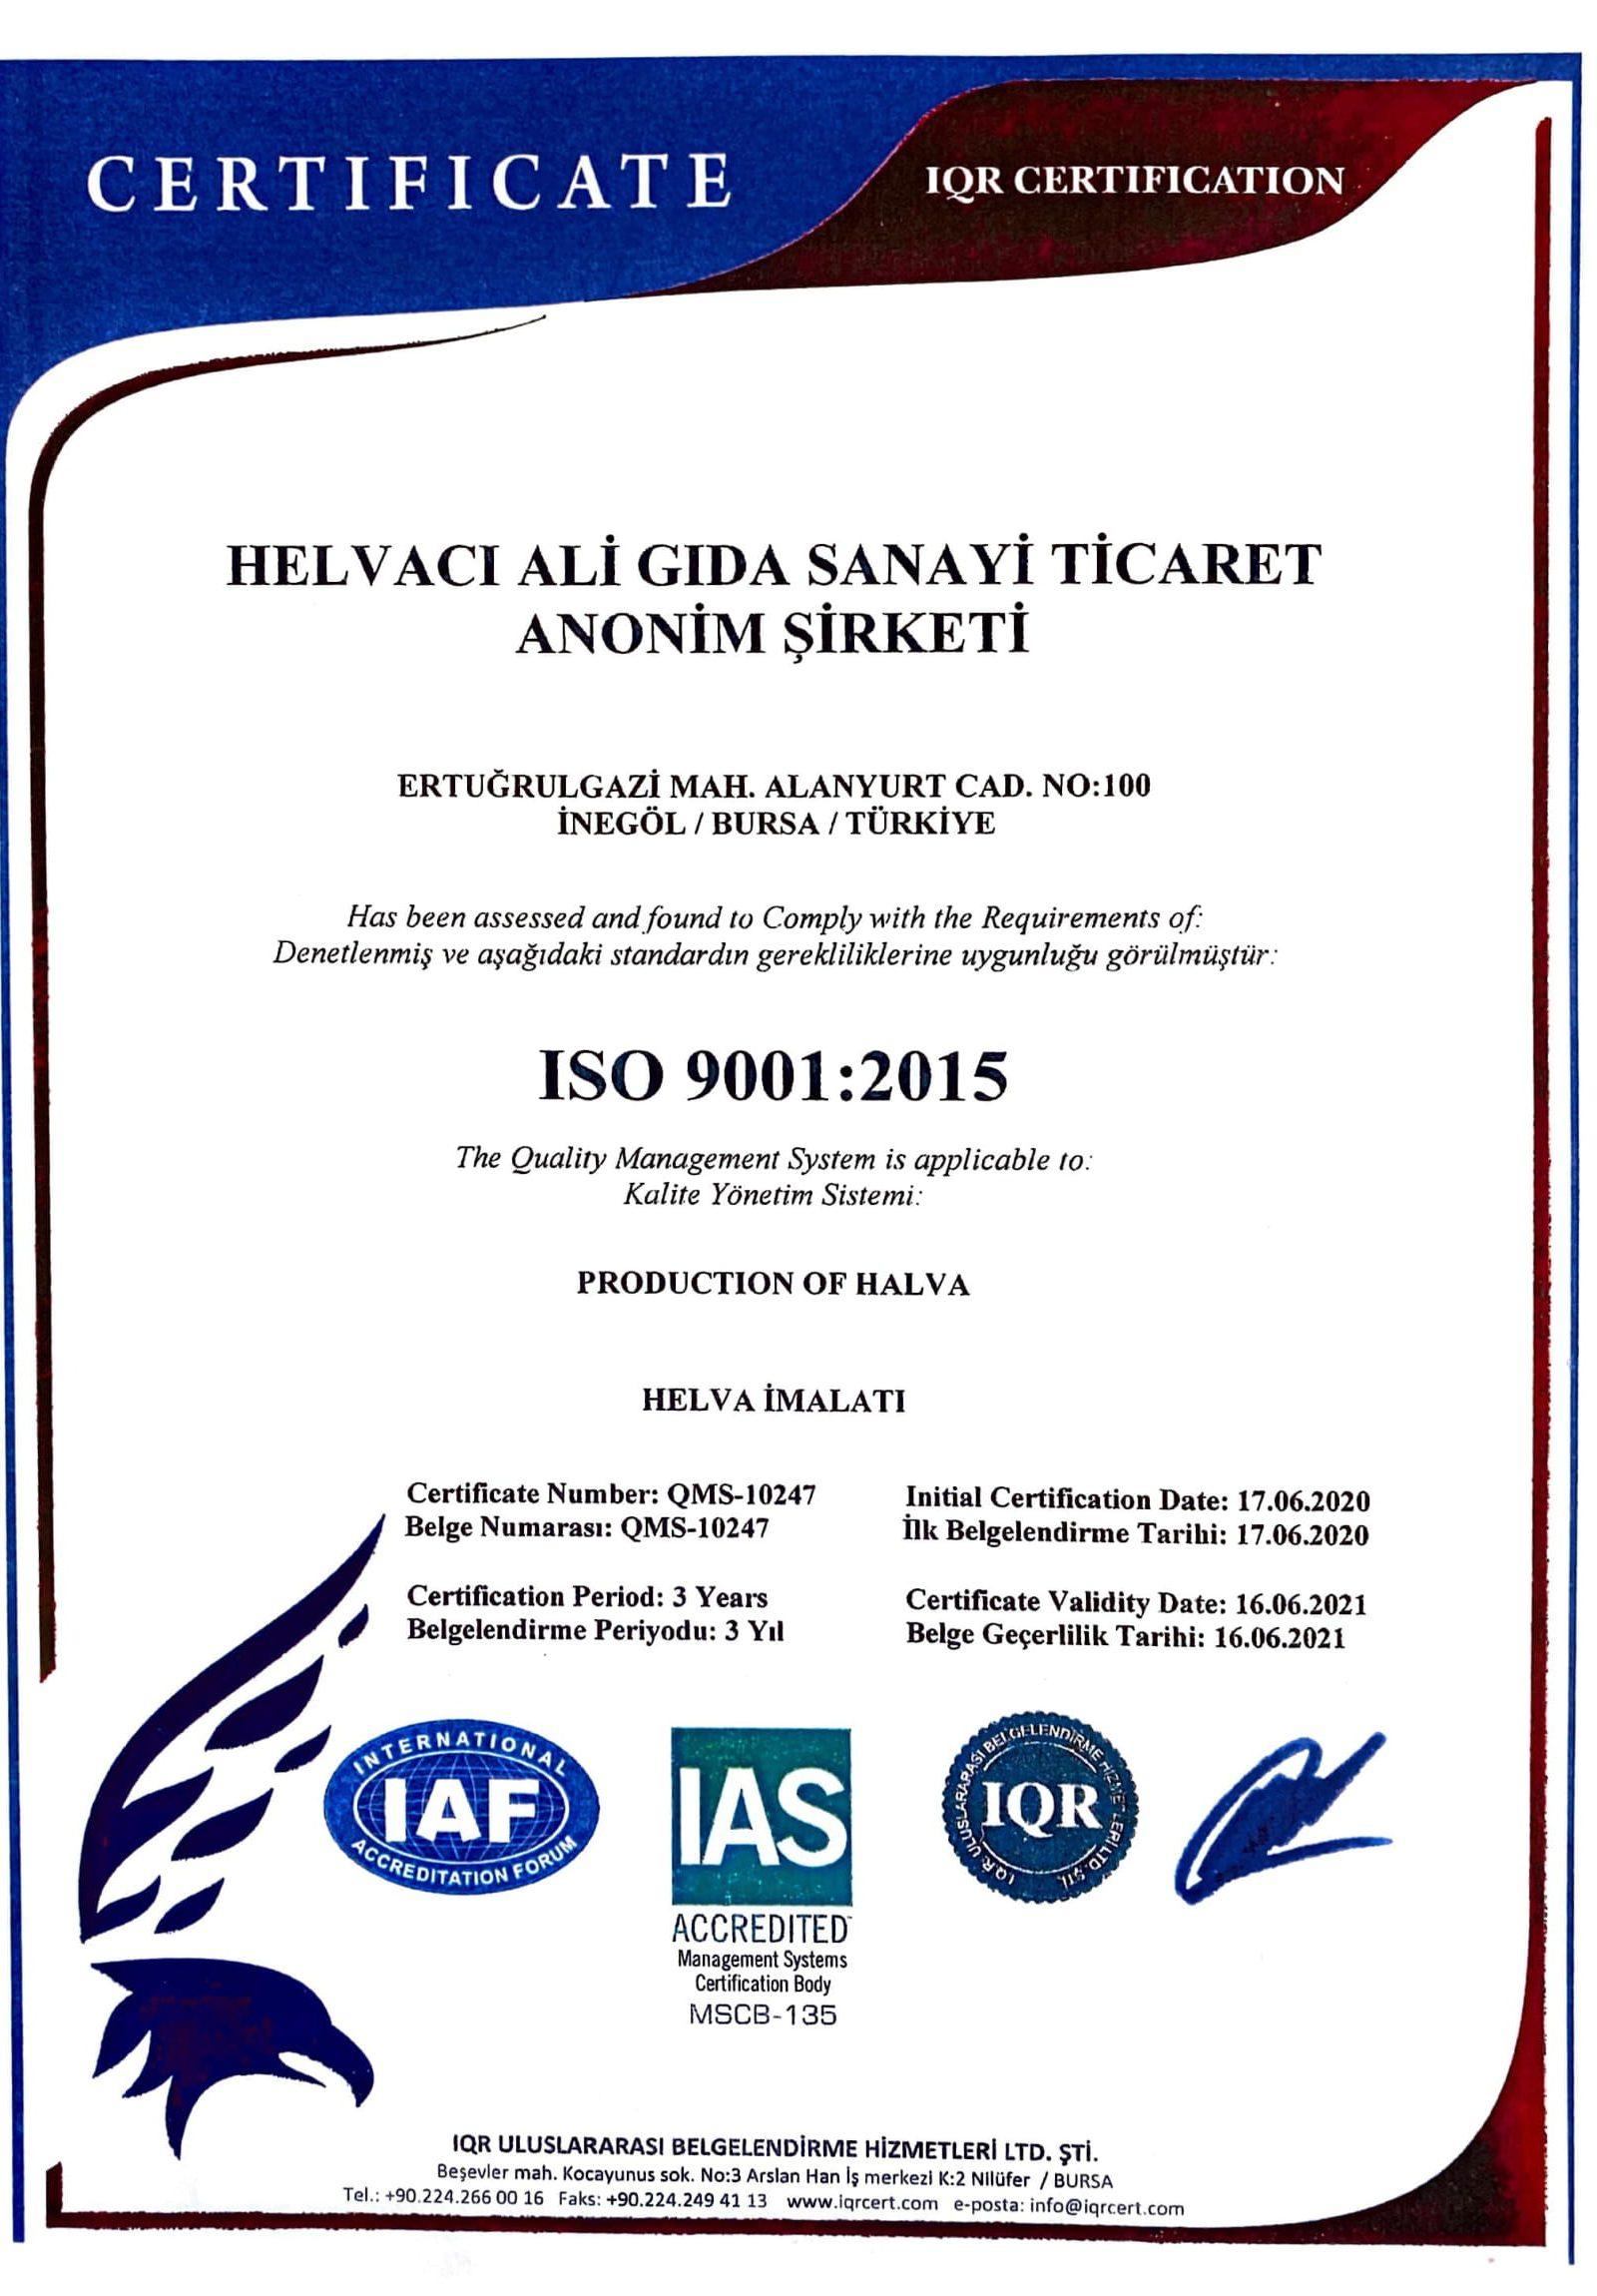 ıqr sertfika 2-1